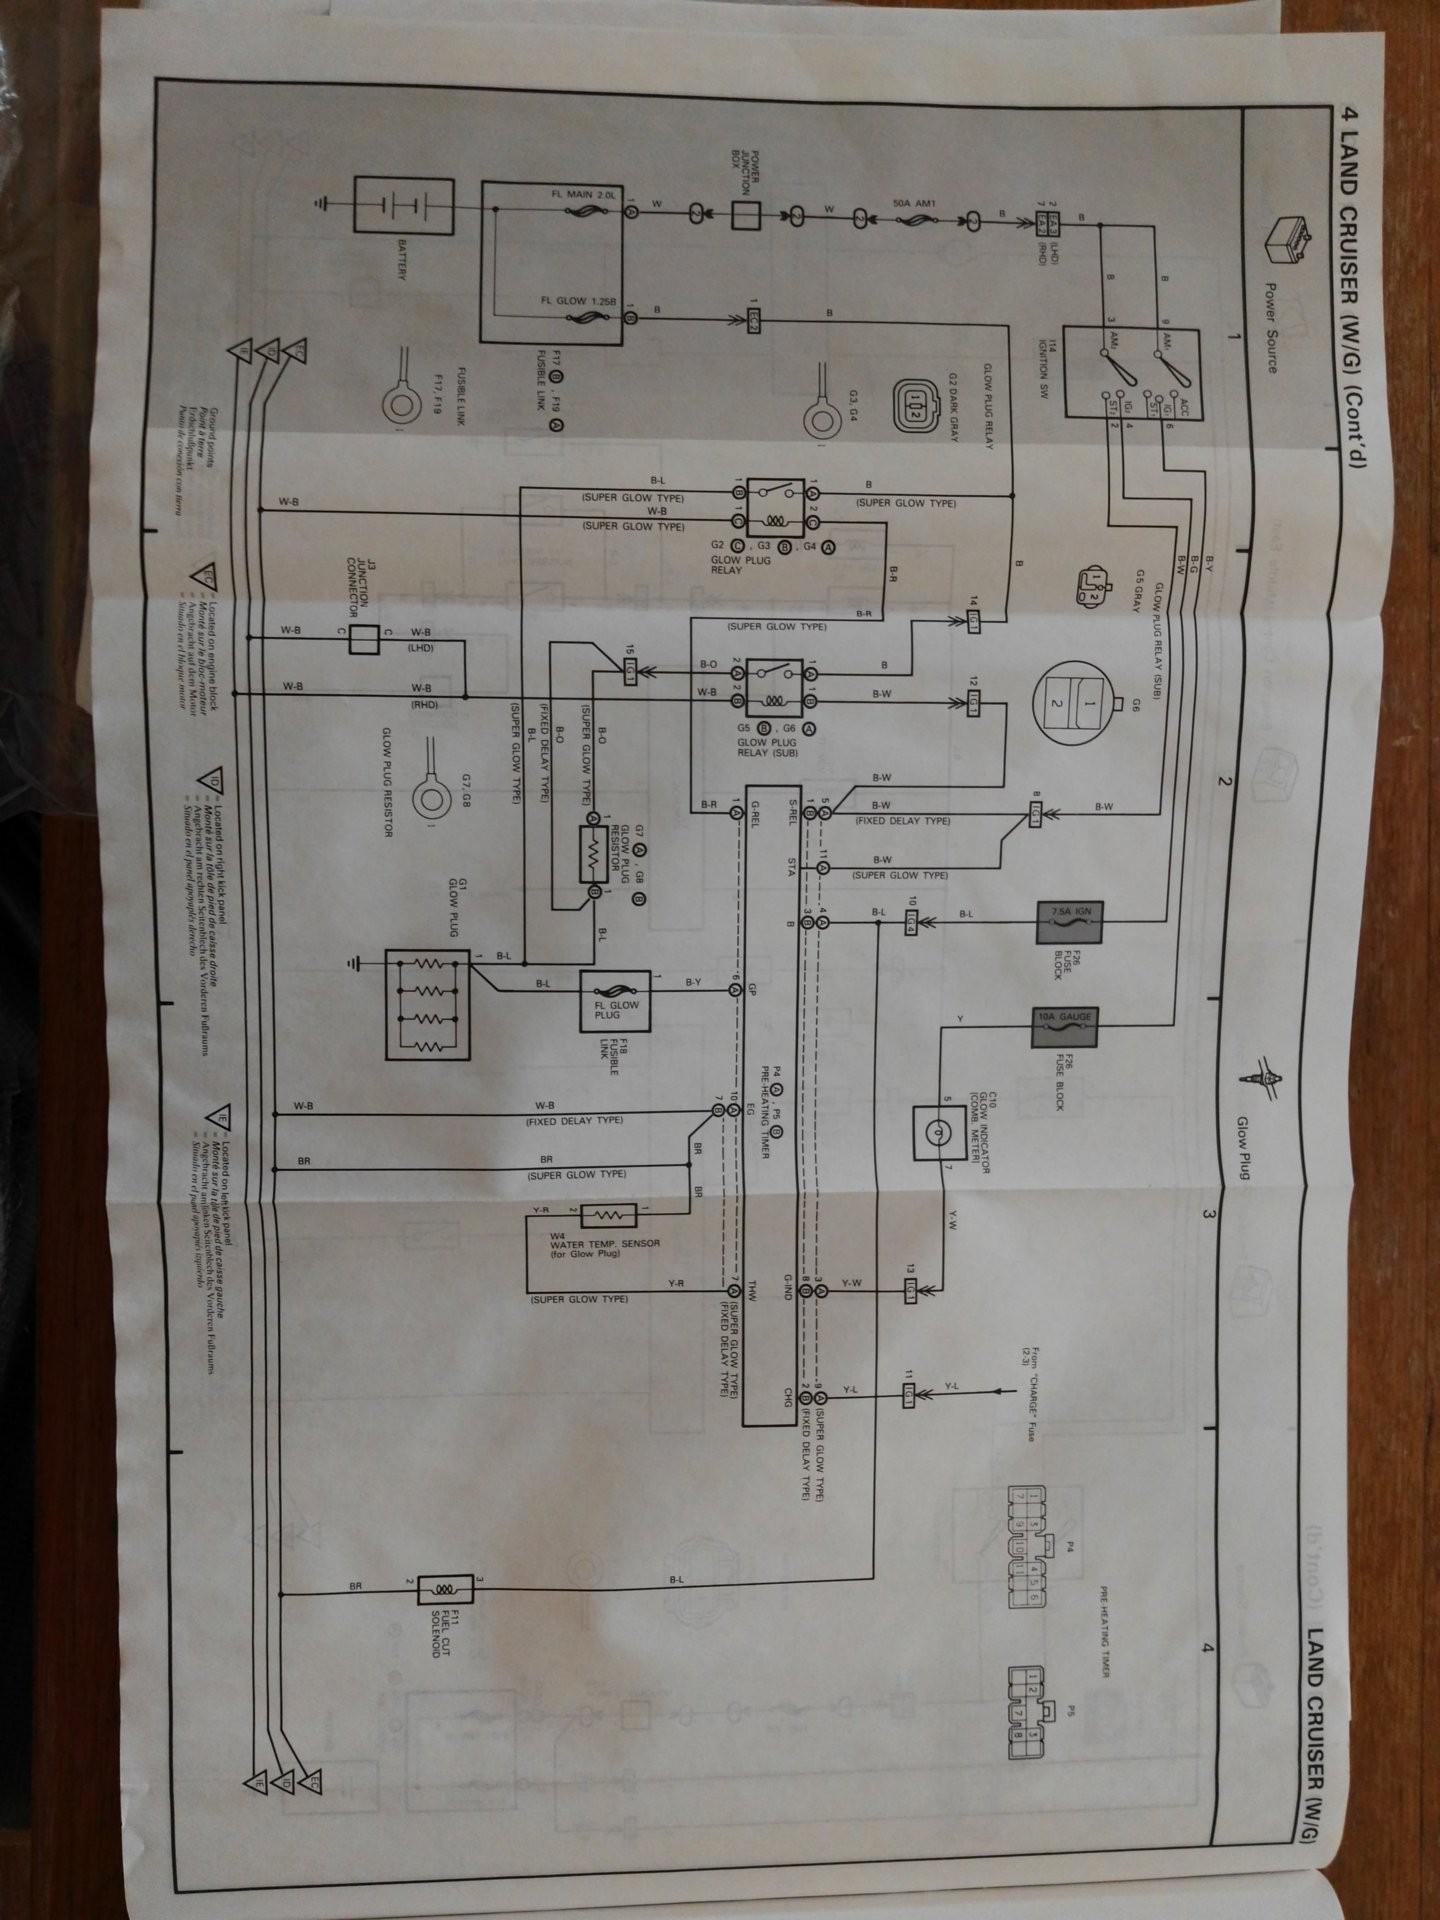 Beru Glow Plug Controller Wiring Diagram Mn 9645] Glow Plug Timer Circuit Diagram Glow Plug Timer Of Beru Glow Plug Controller Wiring Diagram